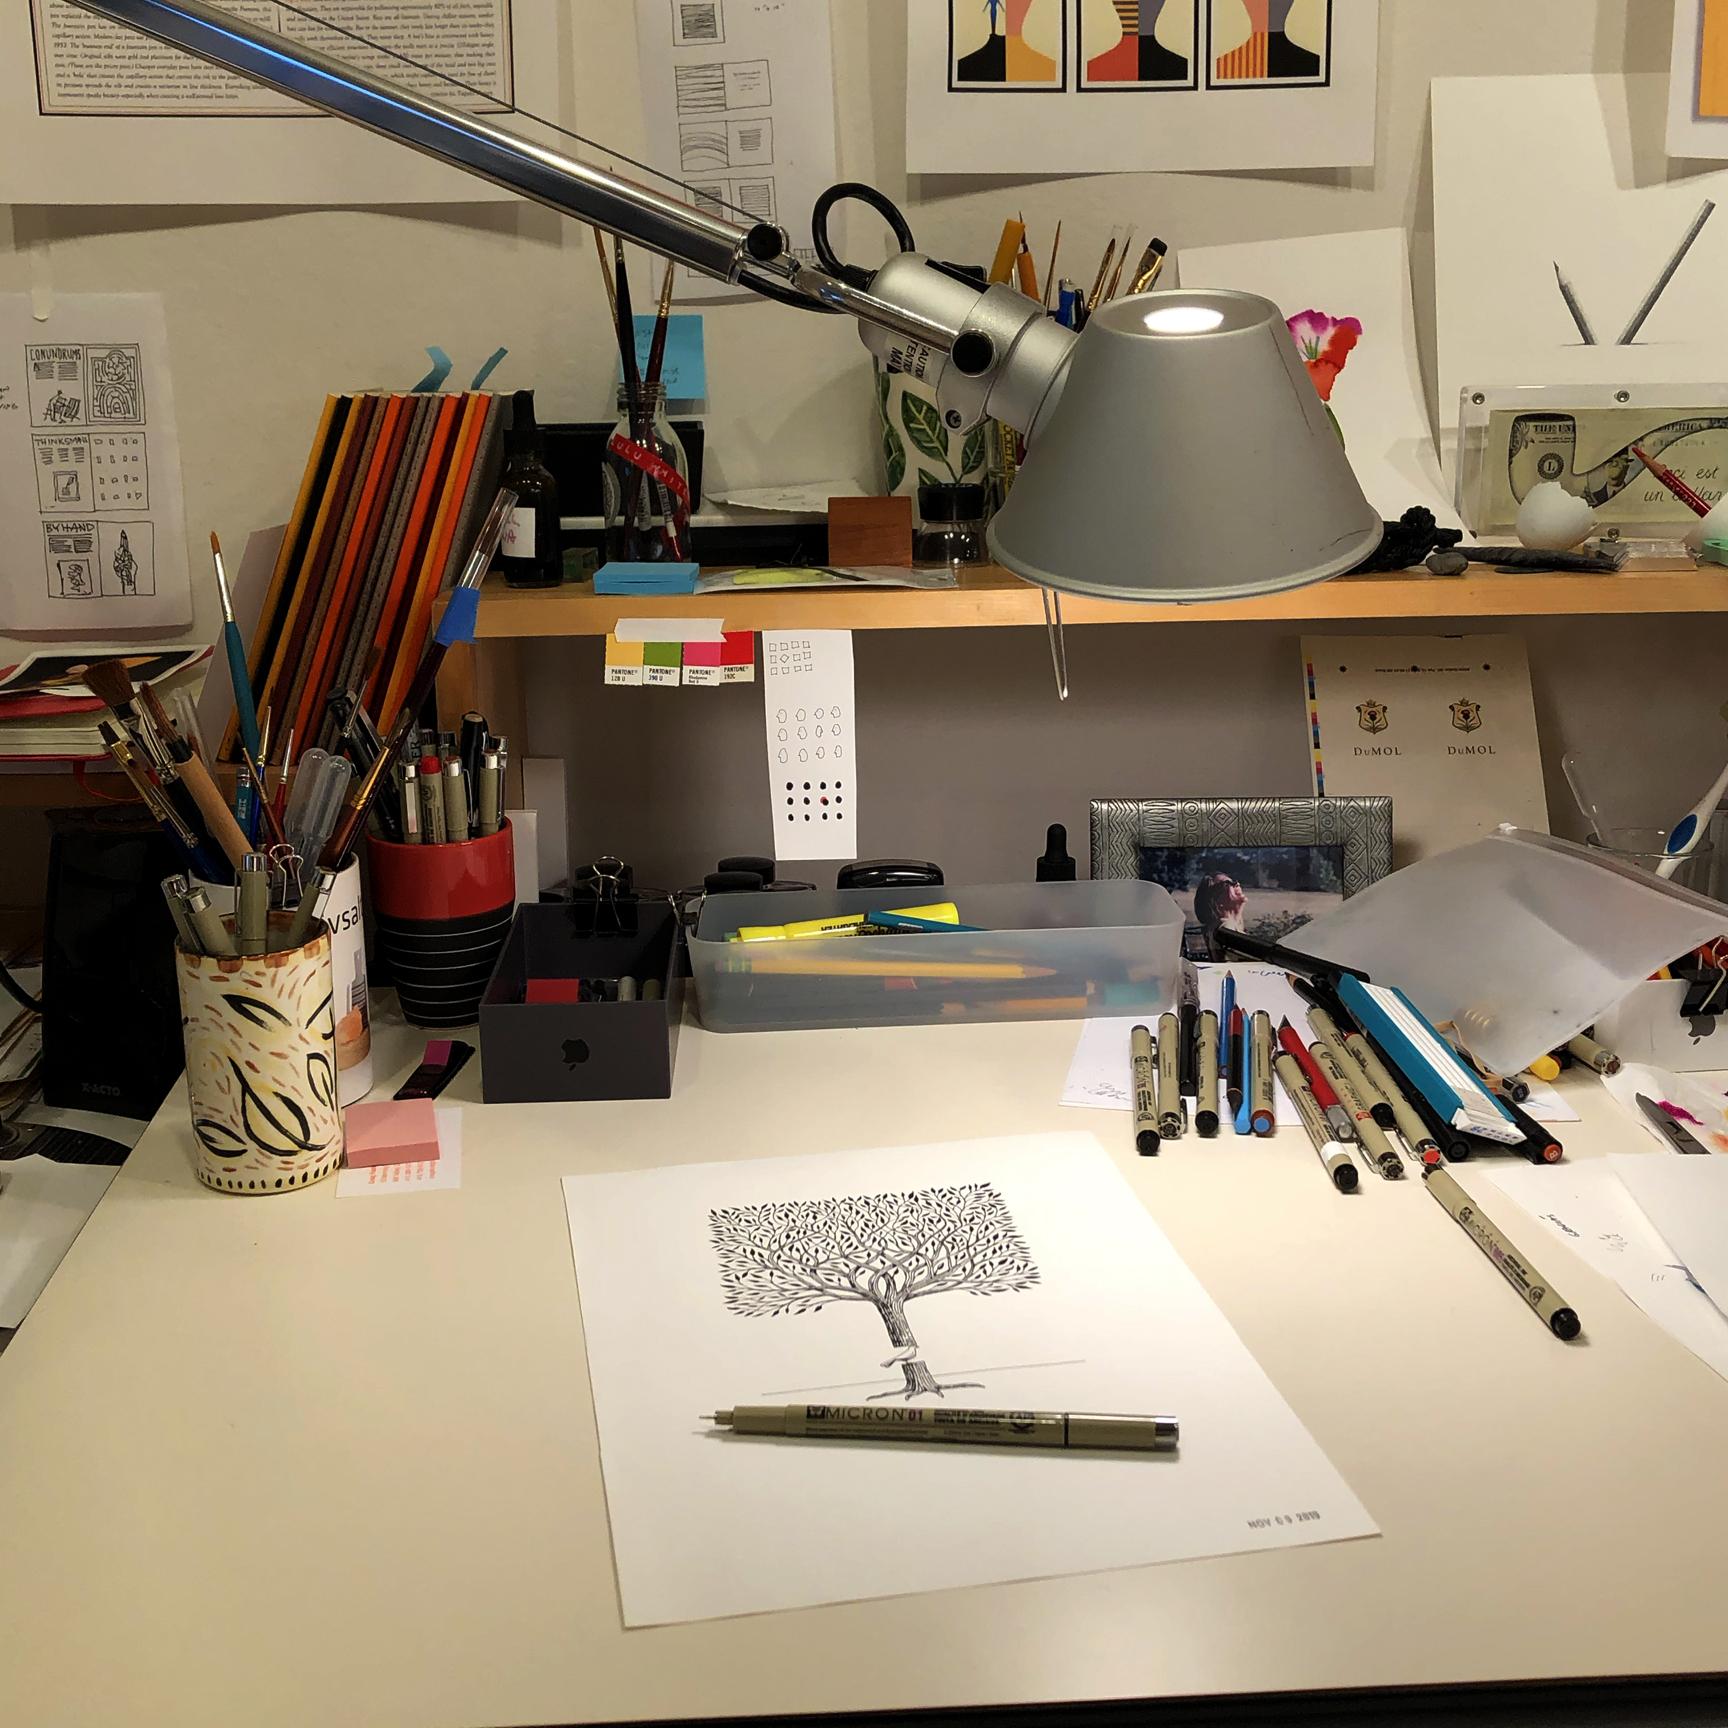 craig_frazier_pen_and_ink_studio.jpeg